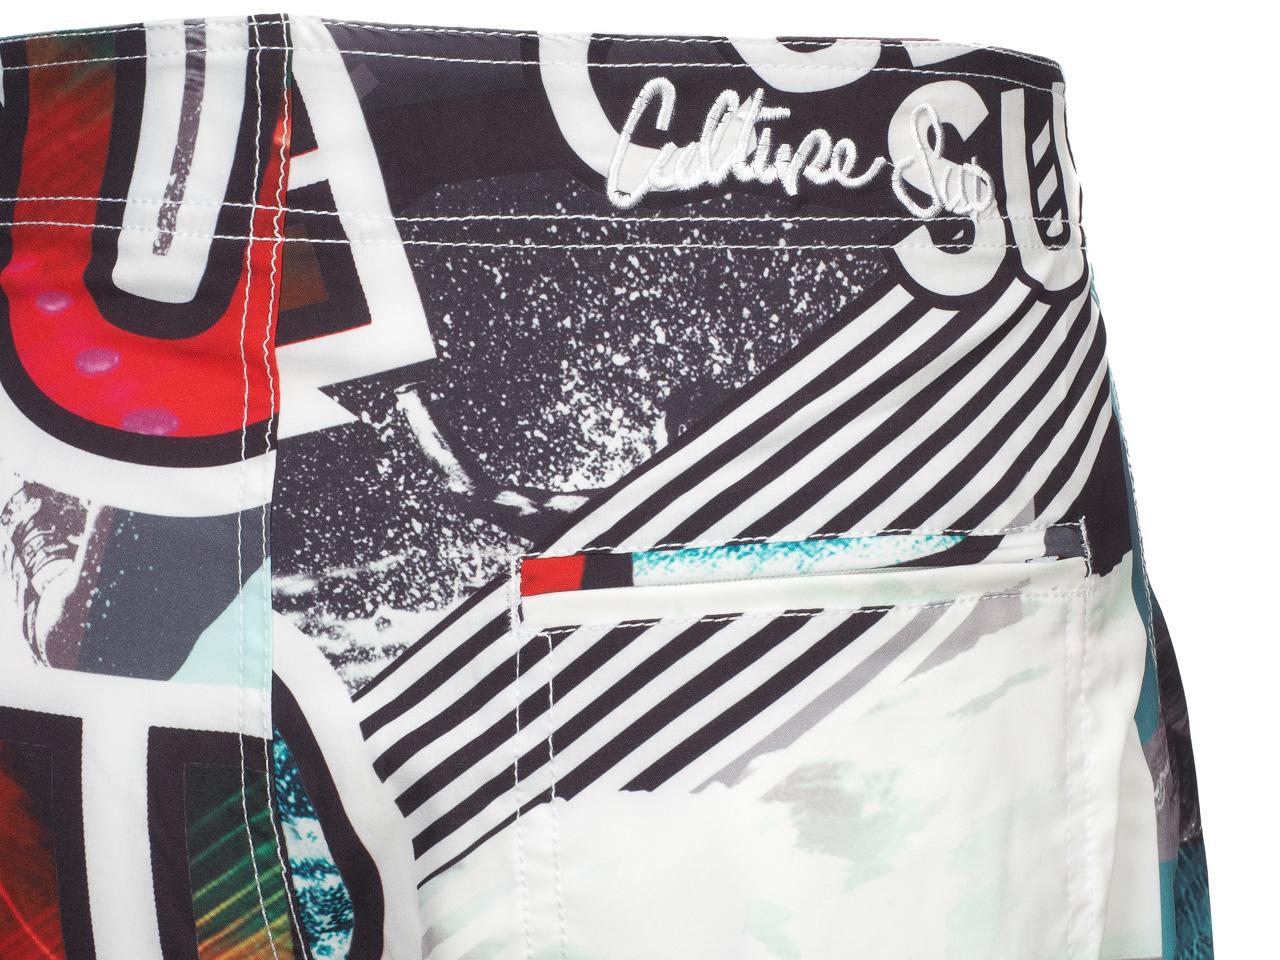 Boardshort-Bathing-Culture-Sud-Ulster-Boardshort-White-37604-New thumbnail 3